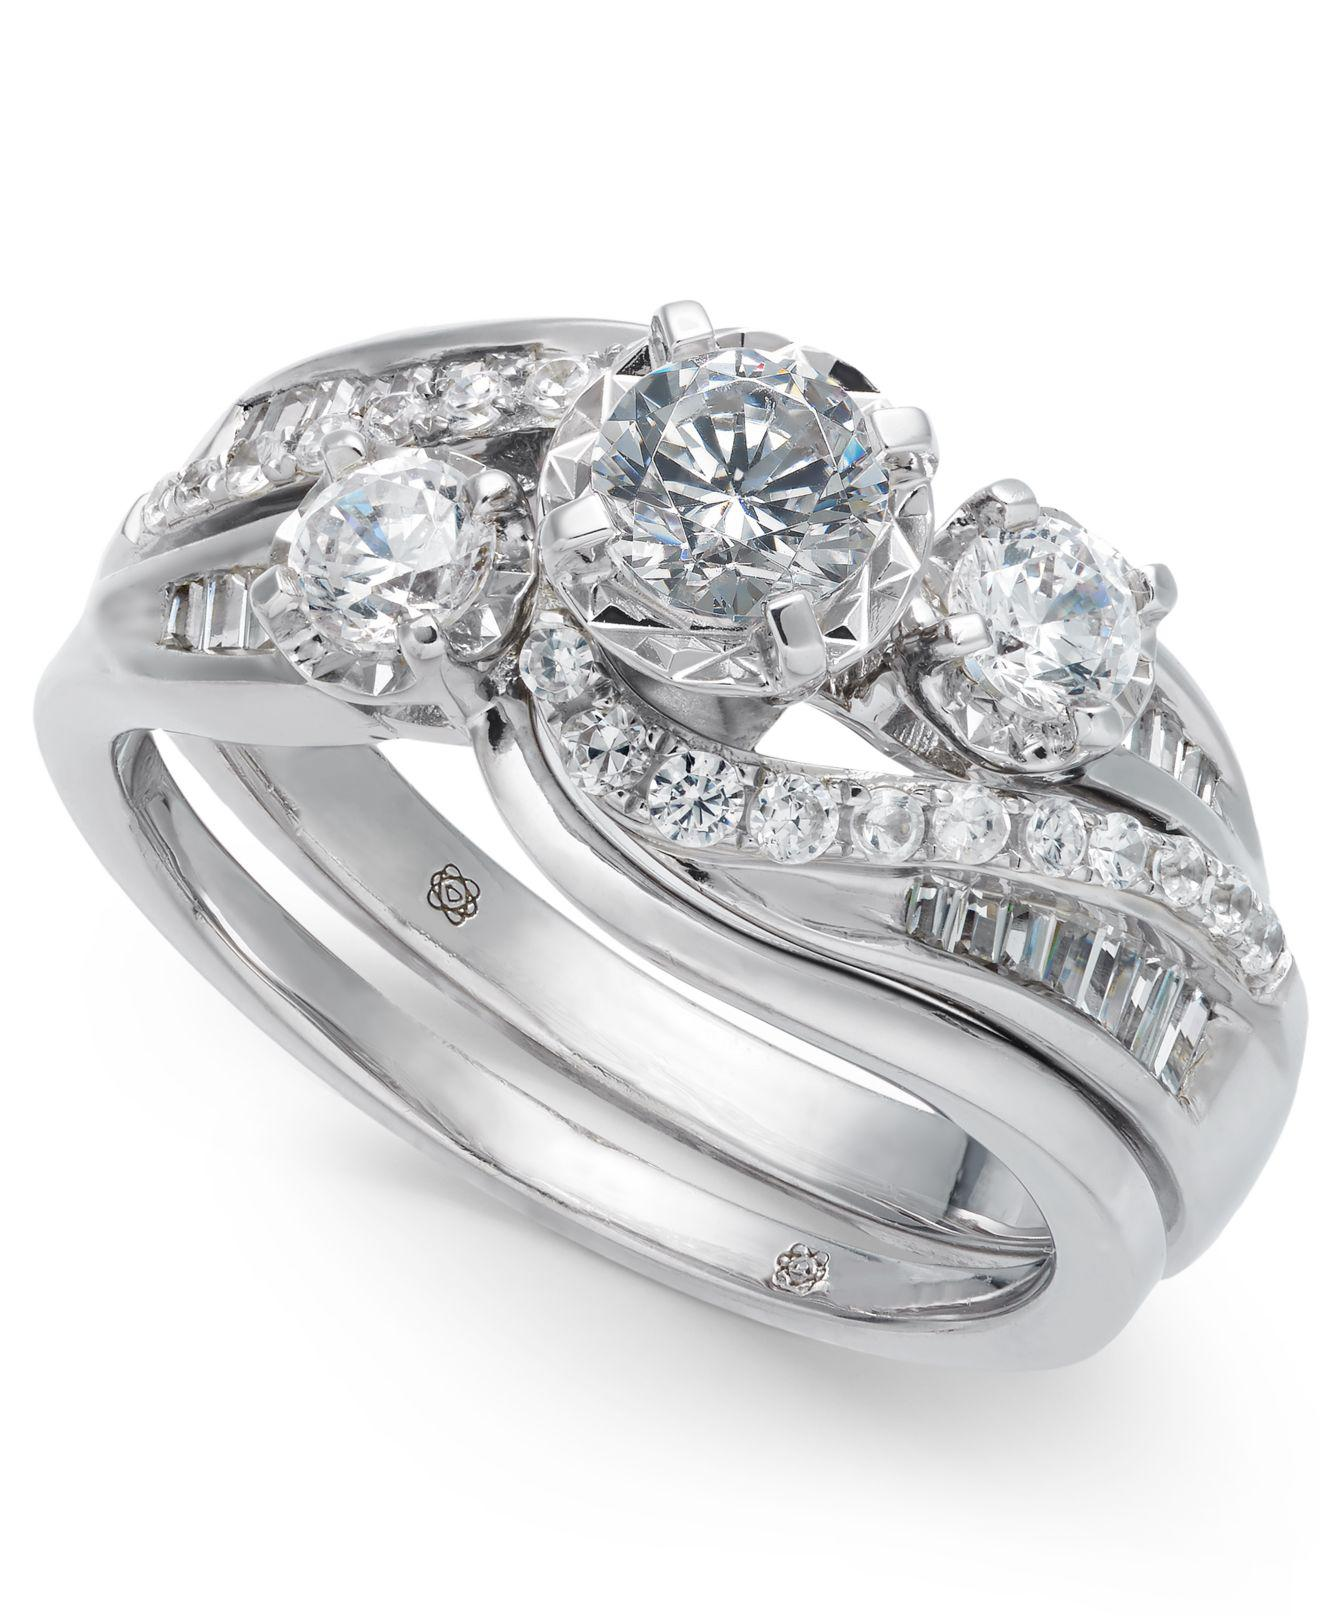 Macy s Diamond Swirl Bridal Set 1 Ct T w In 14k White Gold in